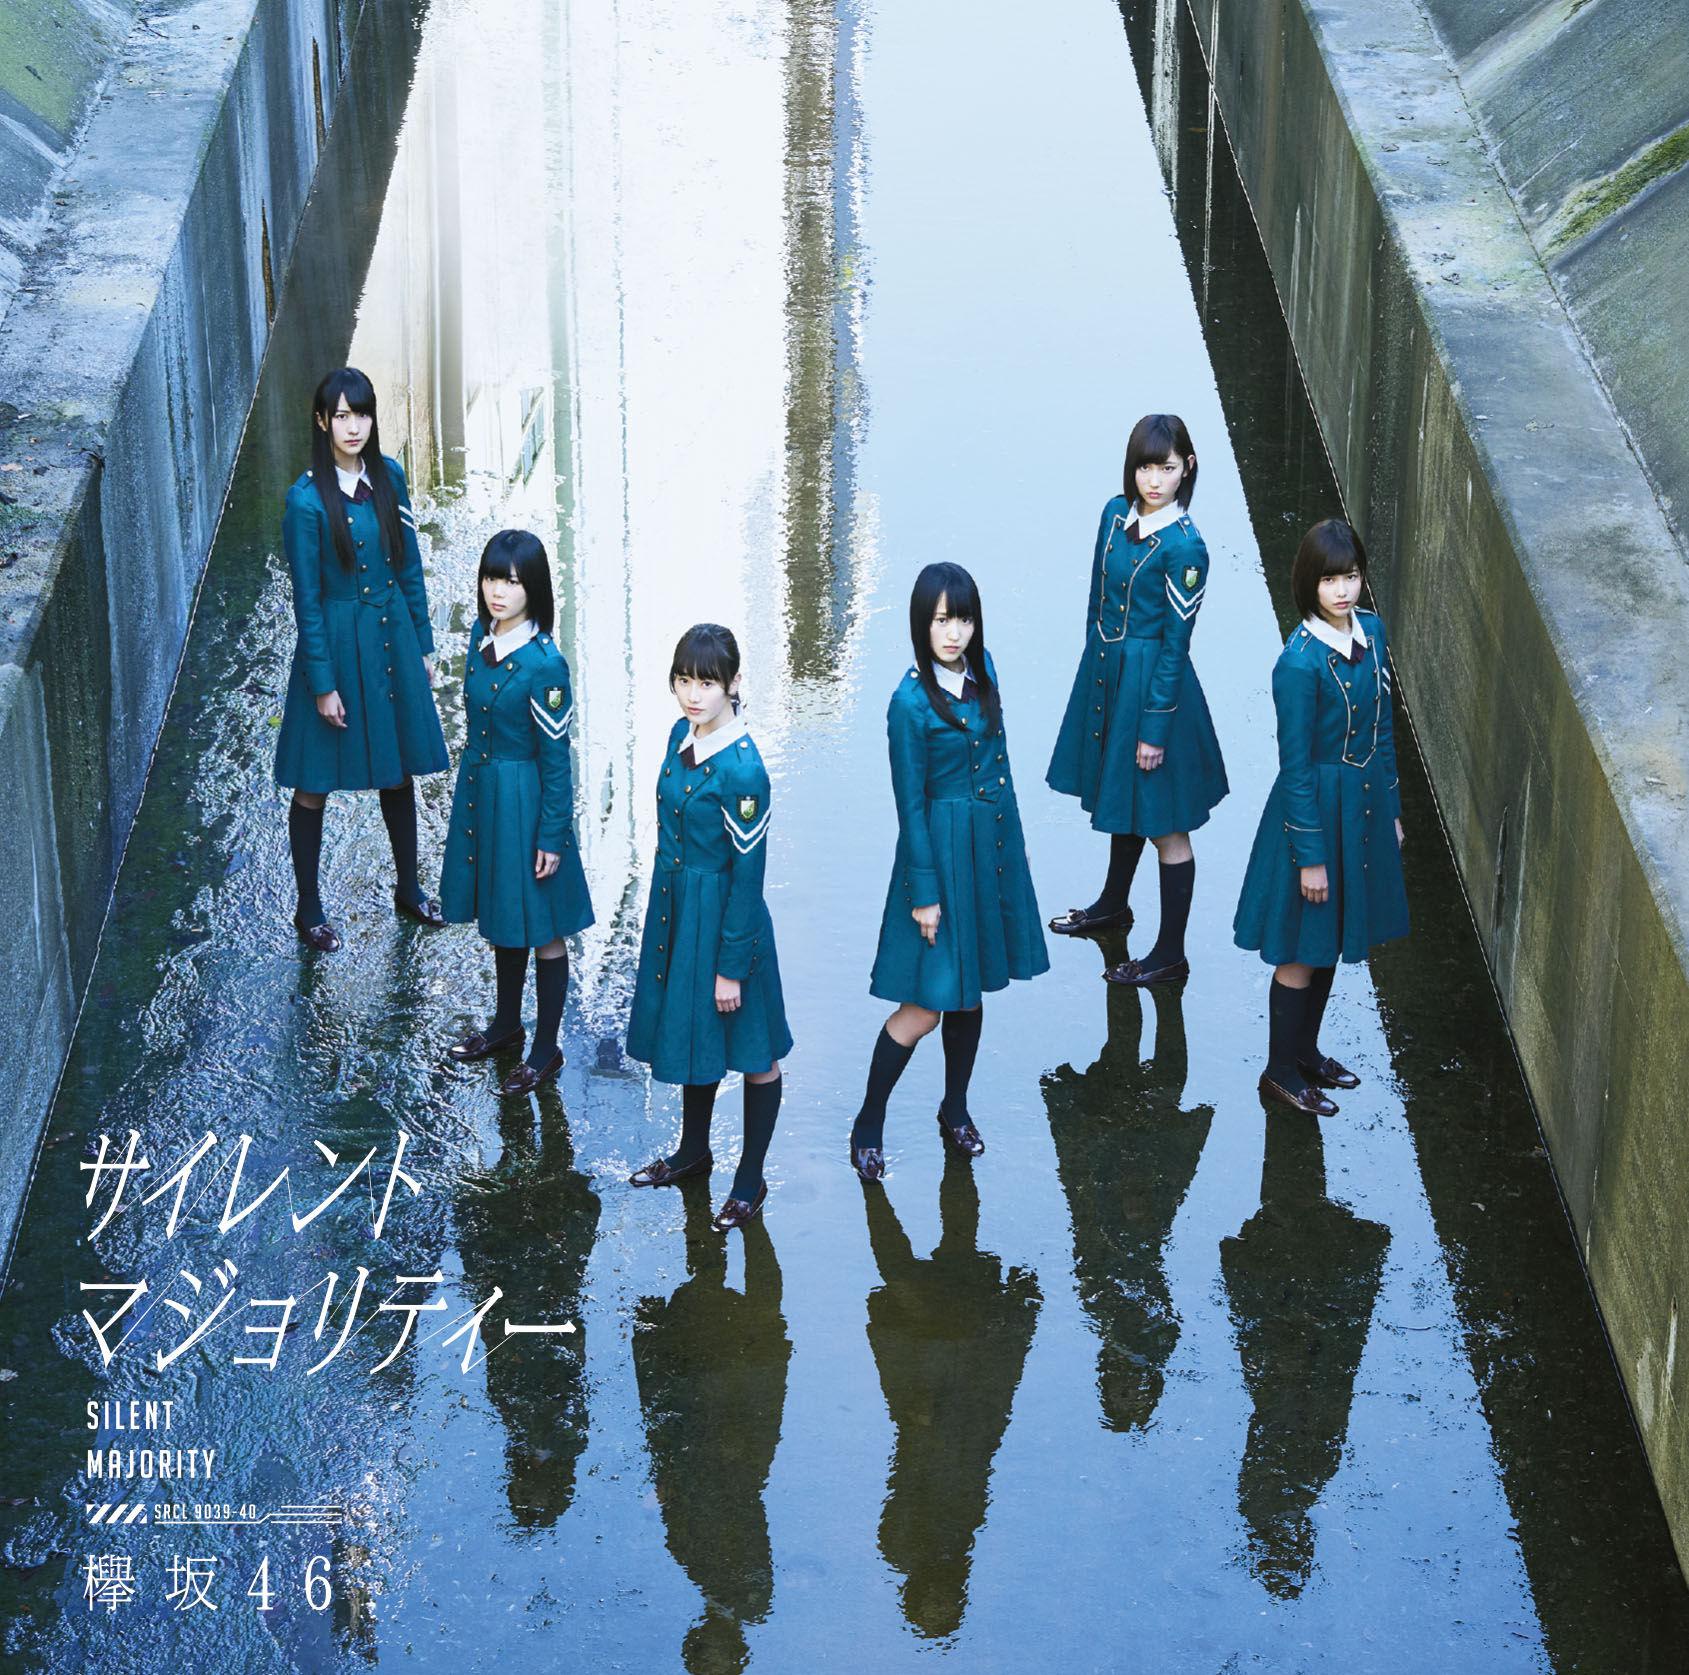 20160518.03.31 Keyakizaka46 - Silent Majority (Type A) (DVD.iso) (JPOP.ru) cover 3.jpg